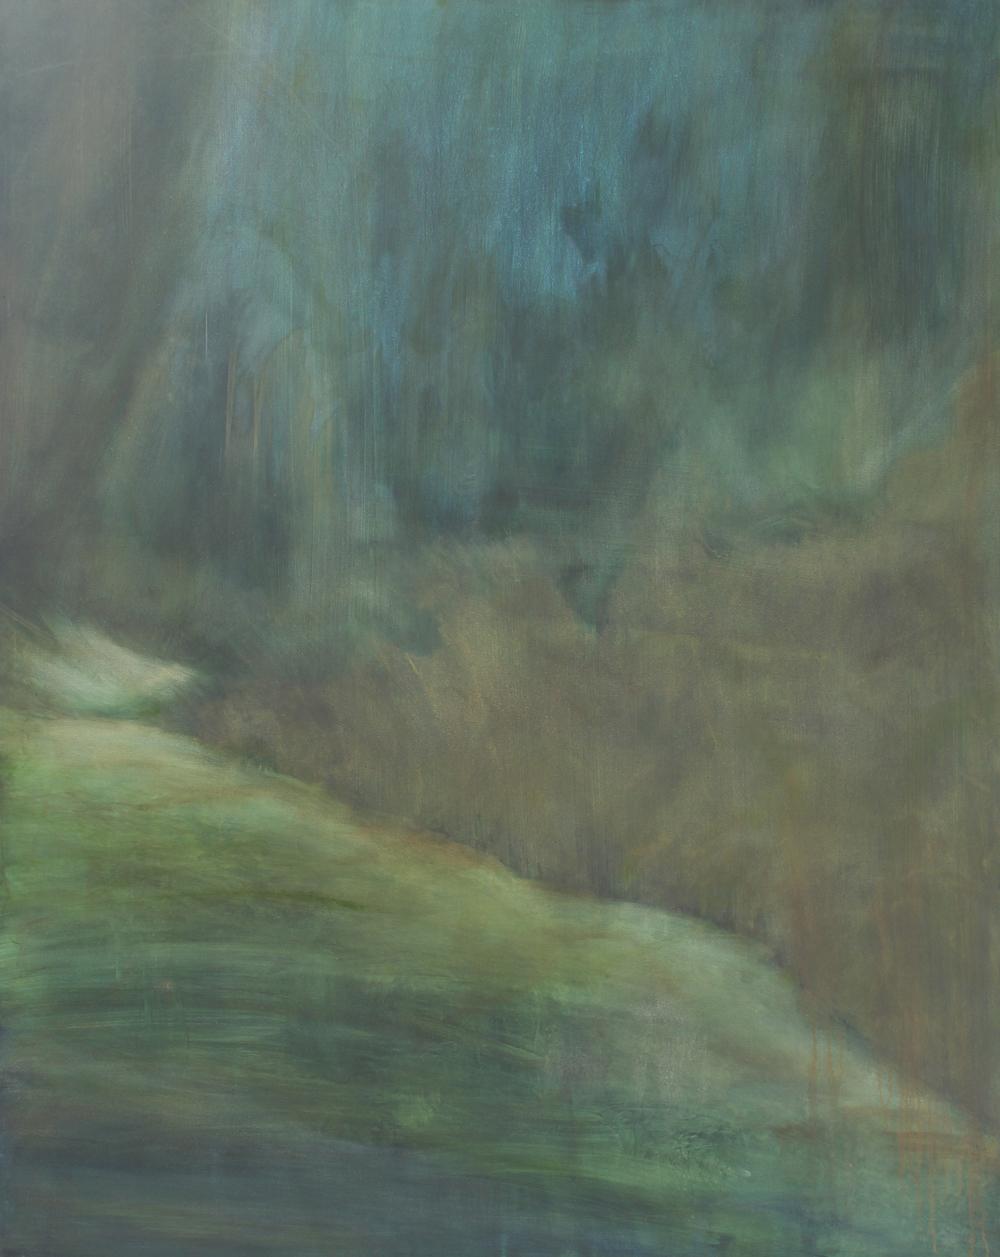 Hightail, 2015, oil on canvas, 150 x 120cm